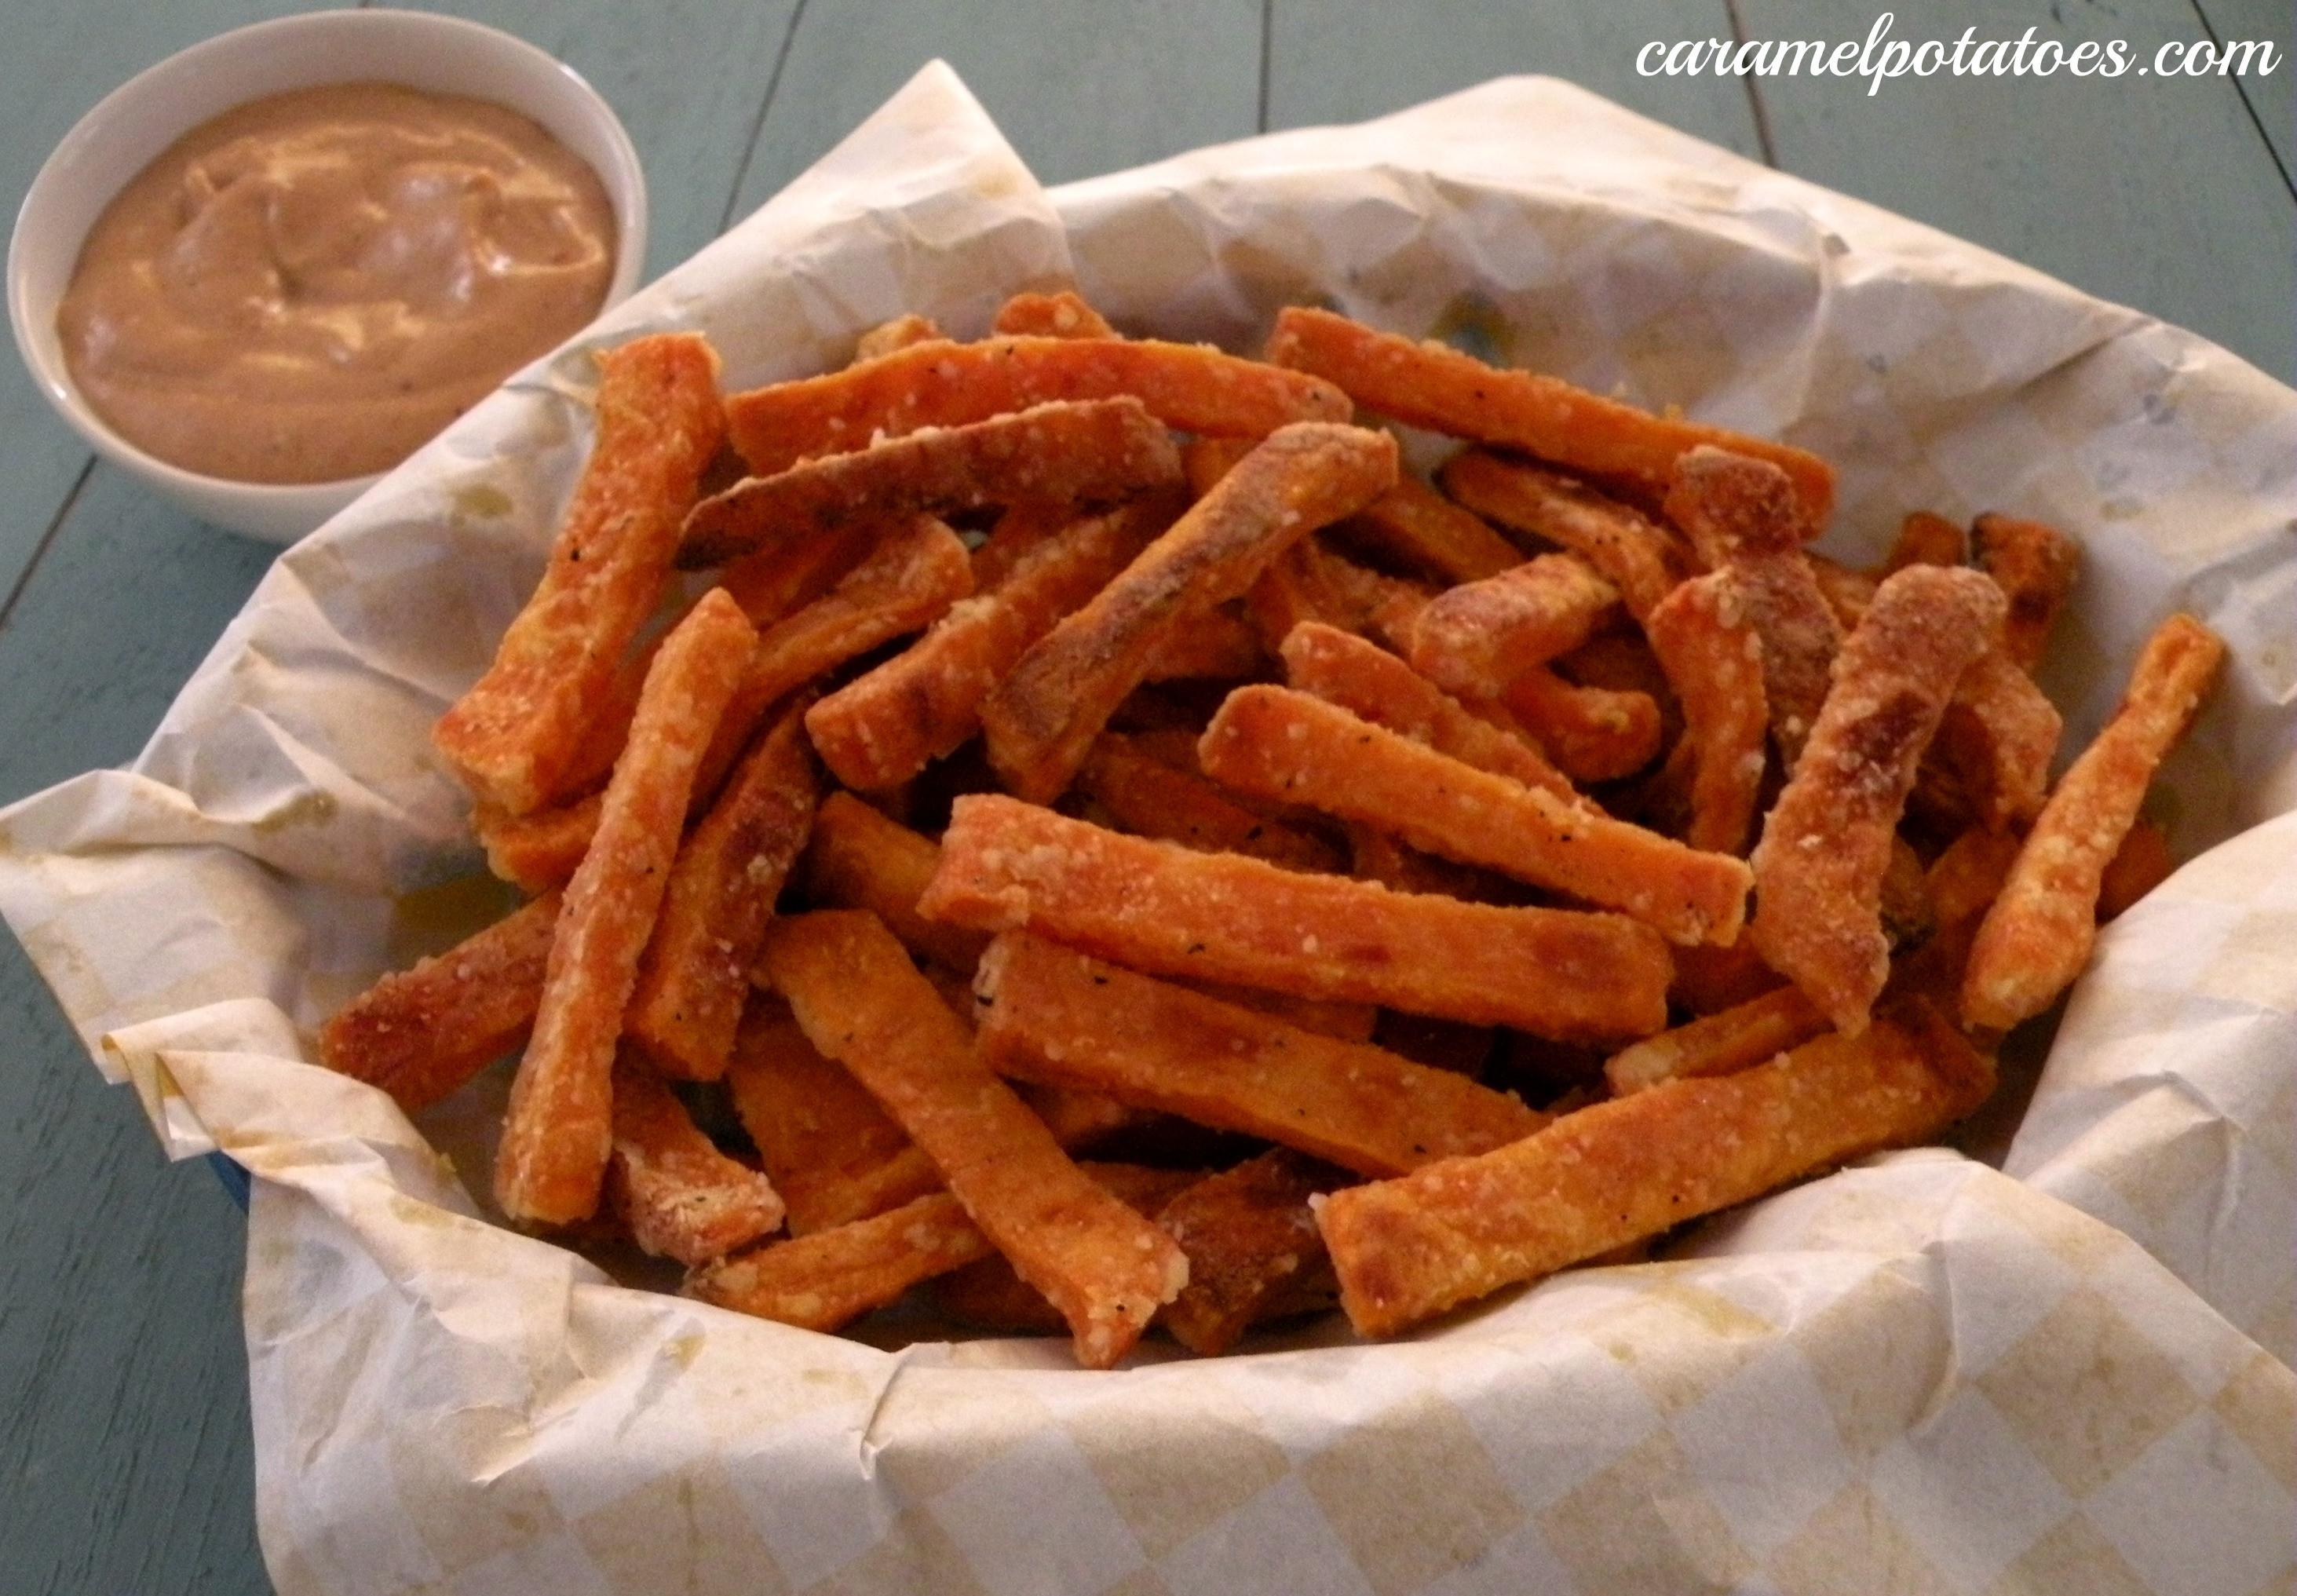 Sweet Potato Oven Fries  Caramel Potatoes Oven Baked Sweet Potato Fries